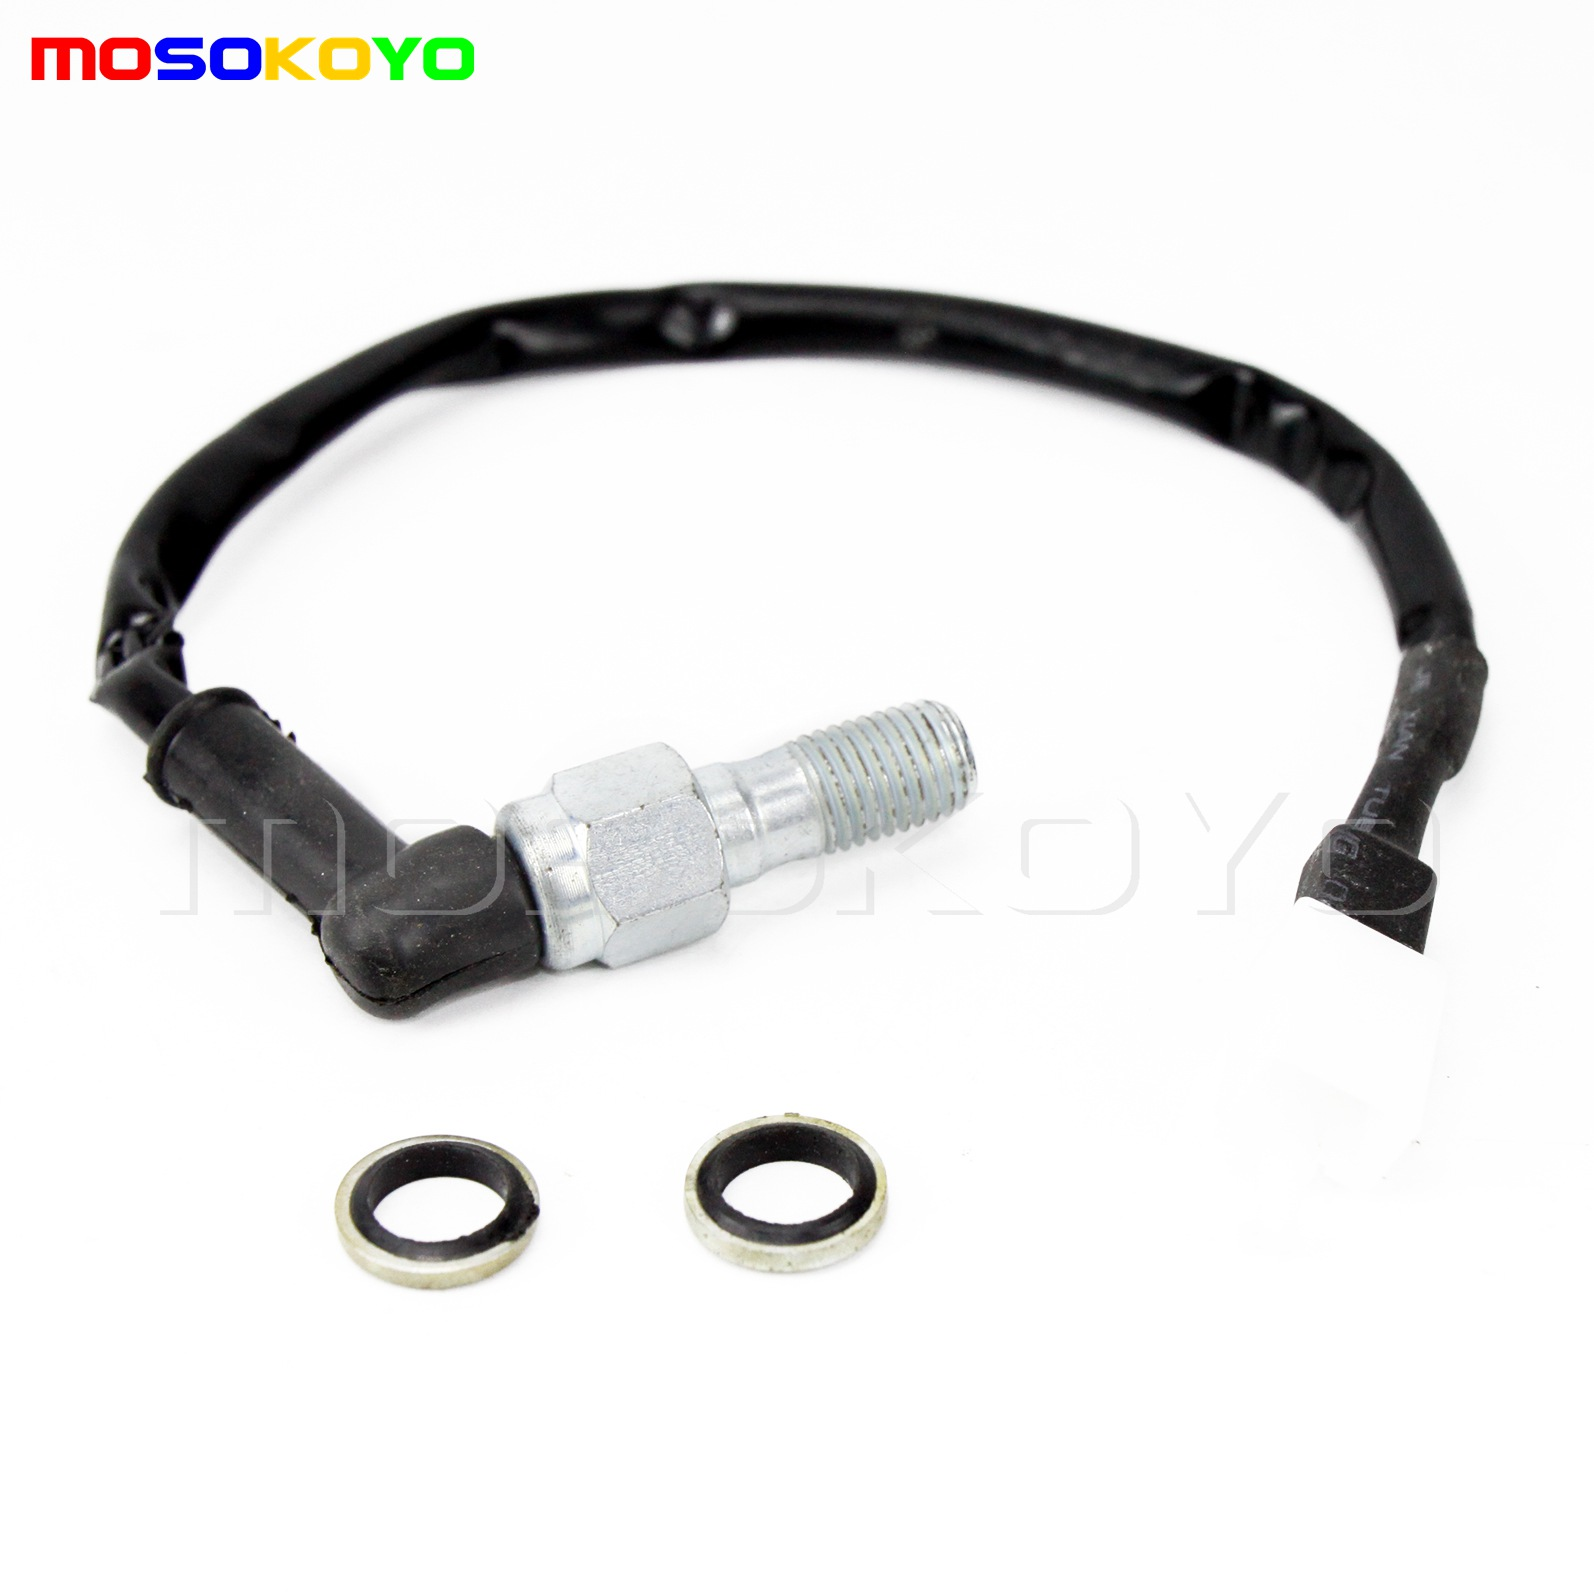 Universal M10x1.25mm Motorcycle Hydraulic Brake Pressure Light Switch Banjo Bolt